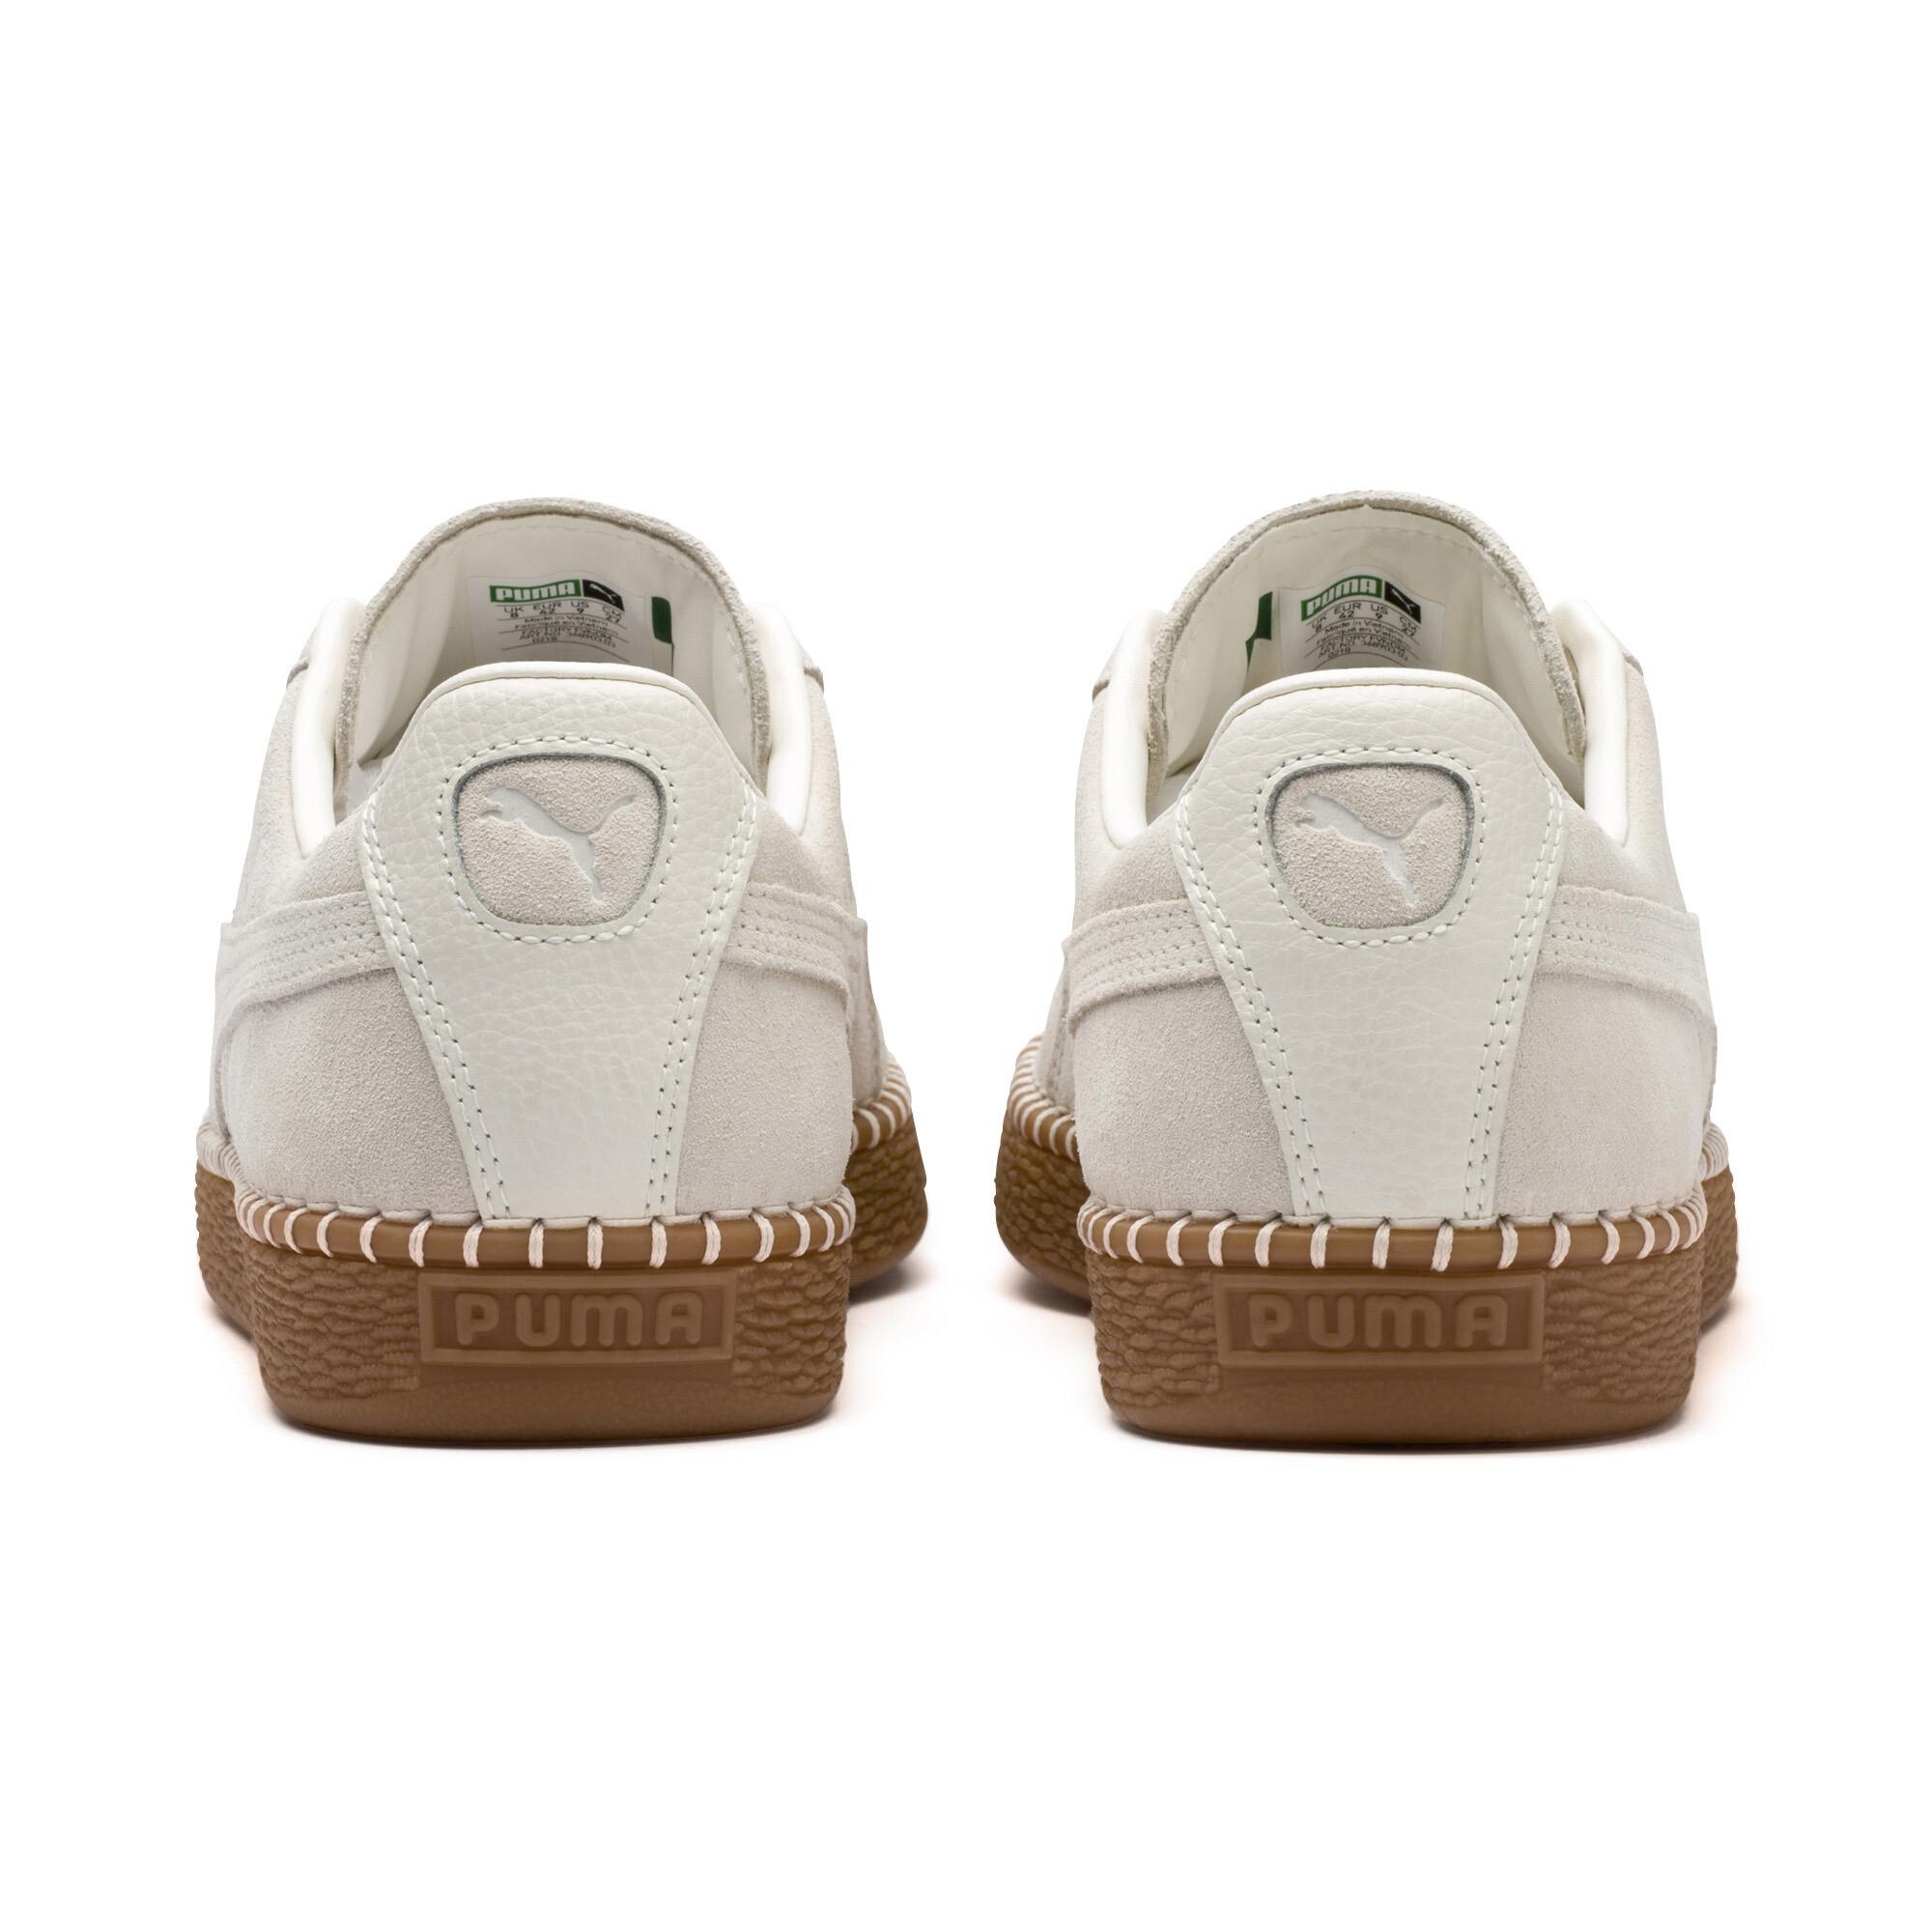 Zapatillas Suede Classic Stitched